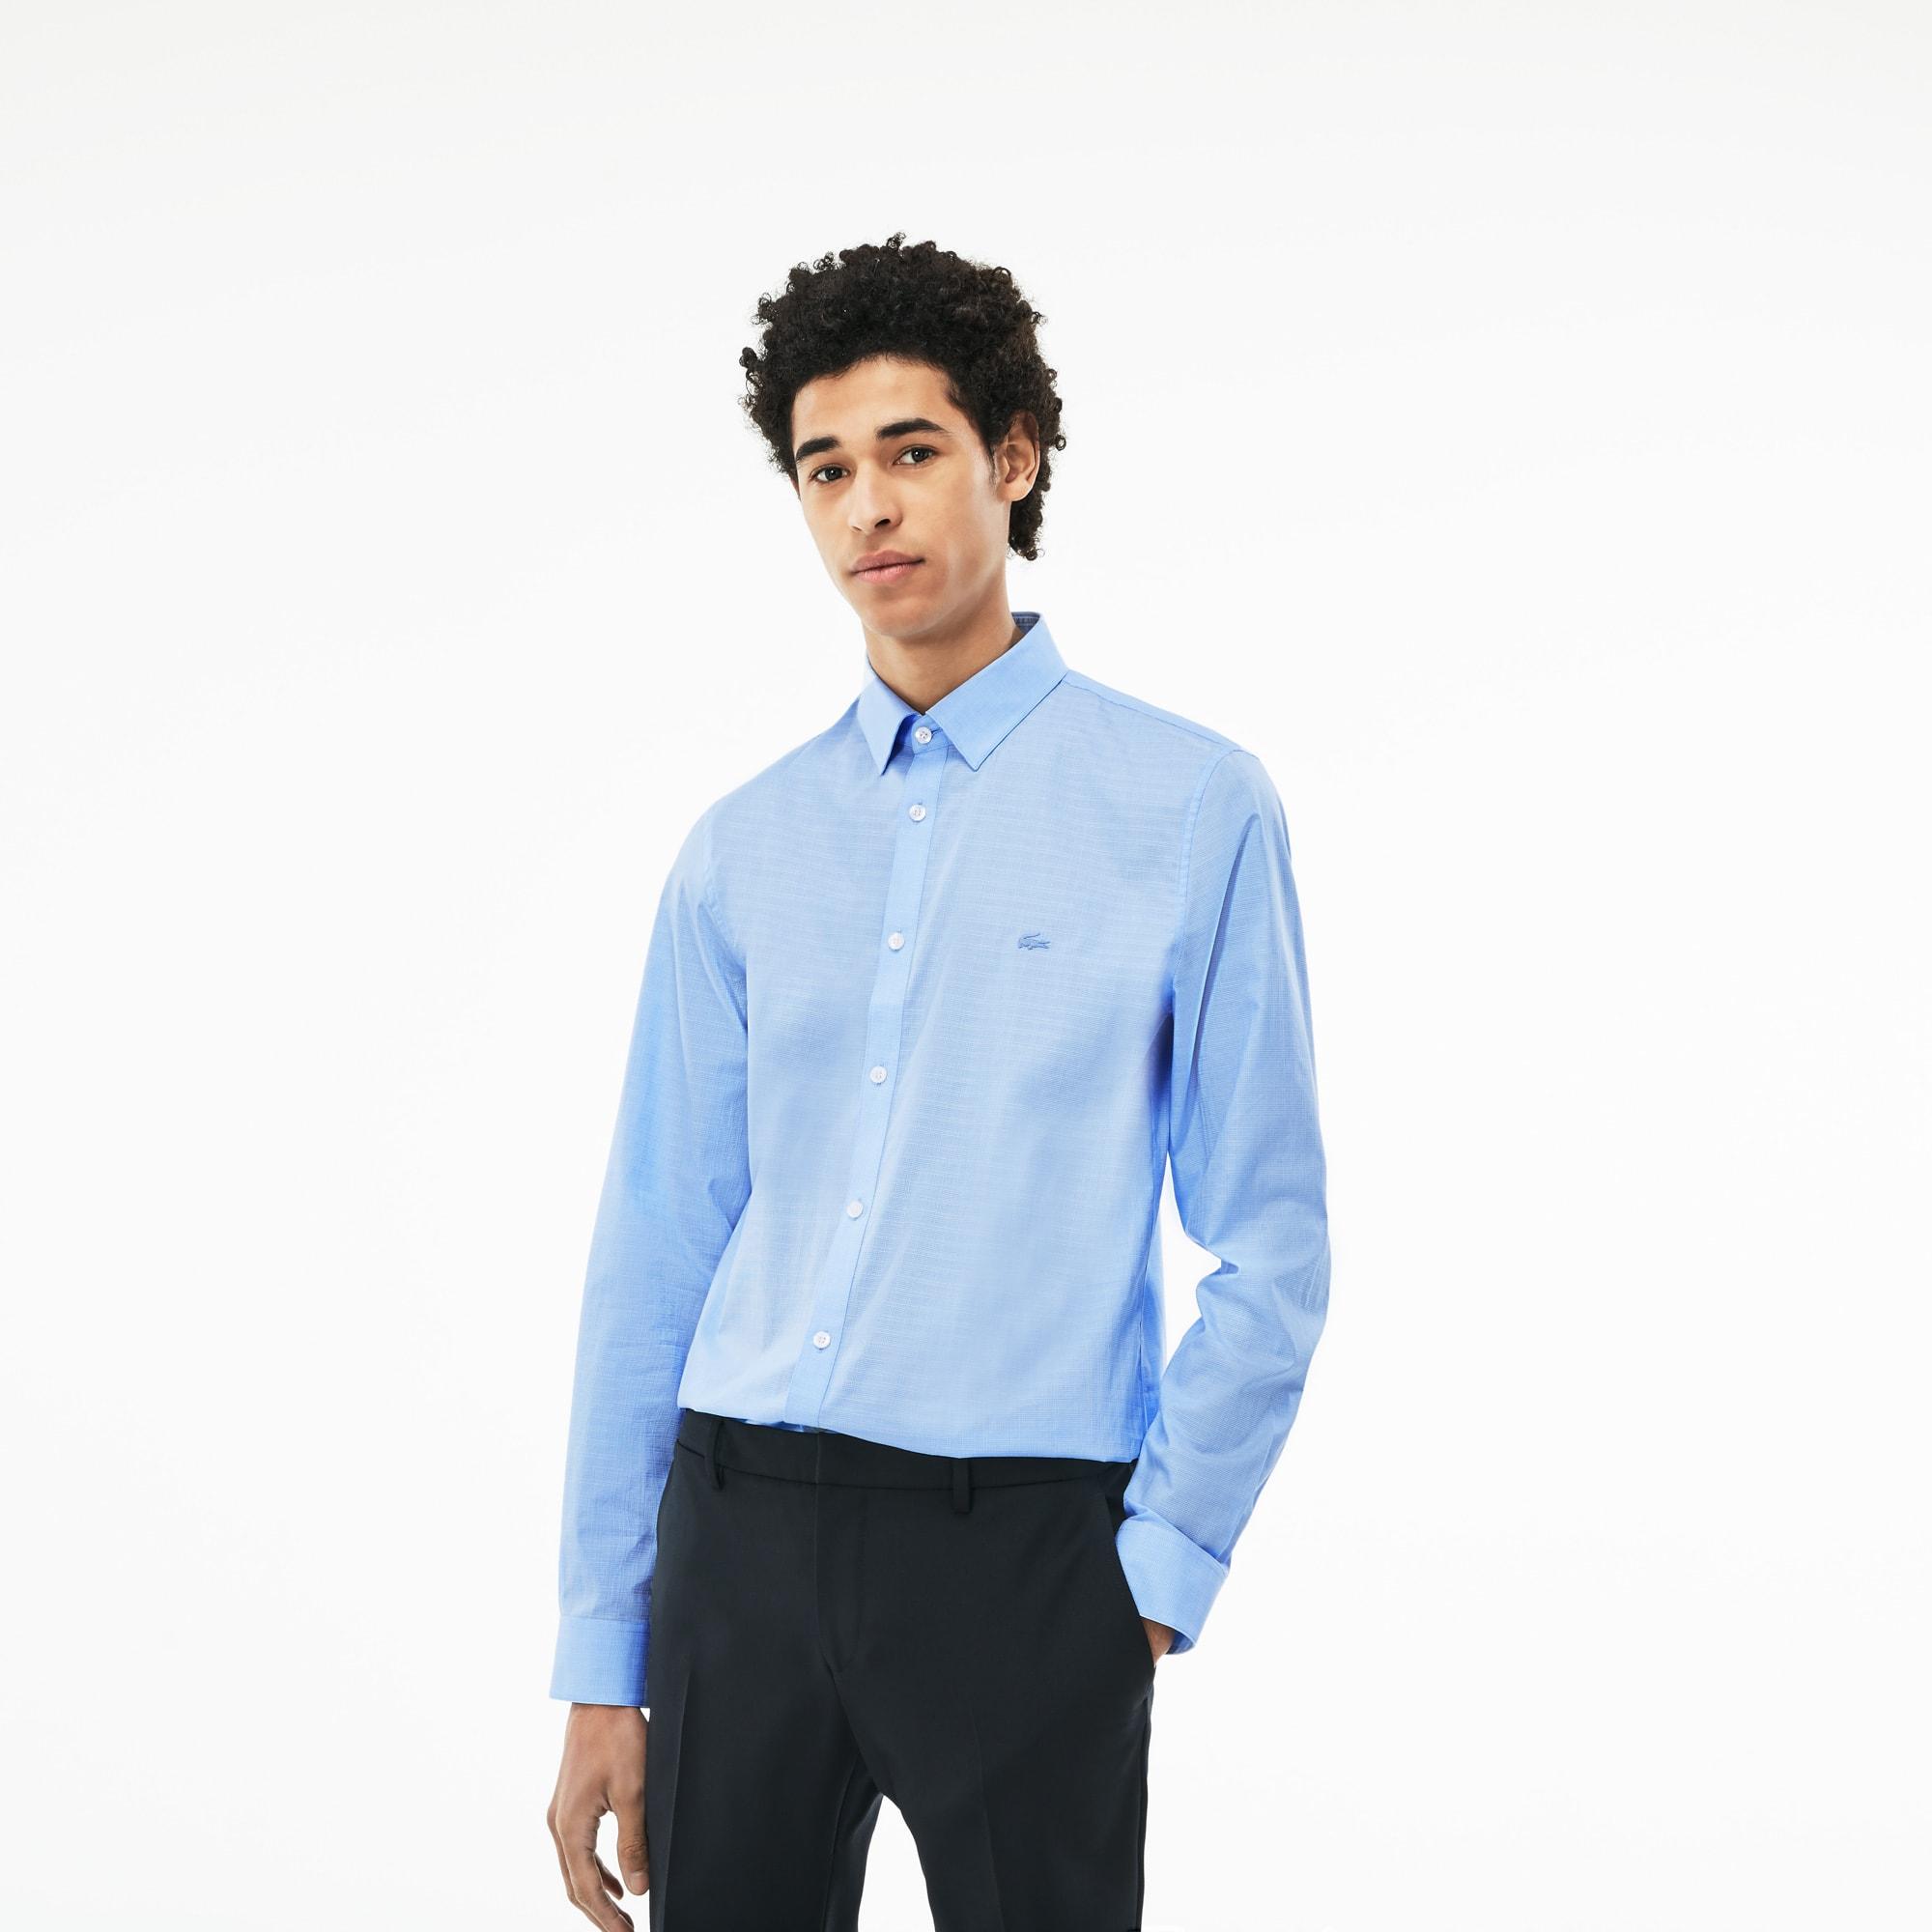 Men's Slim Fit Jacquard Cotton Poplin Shirt